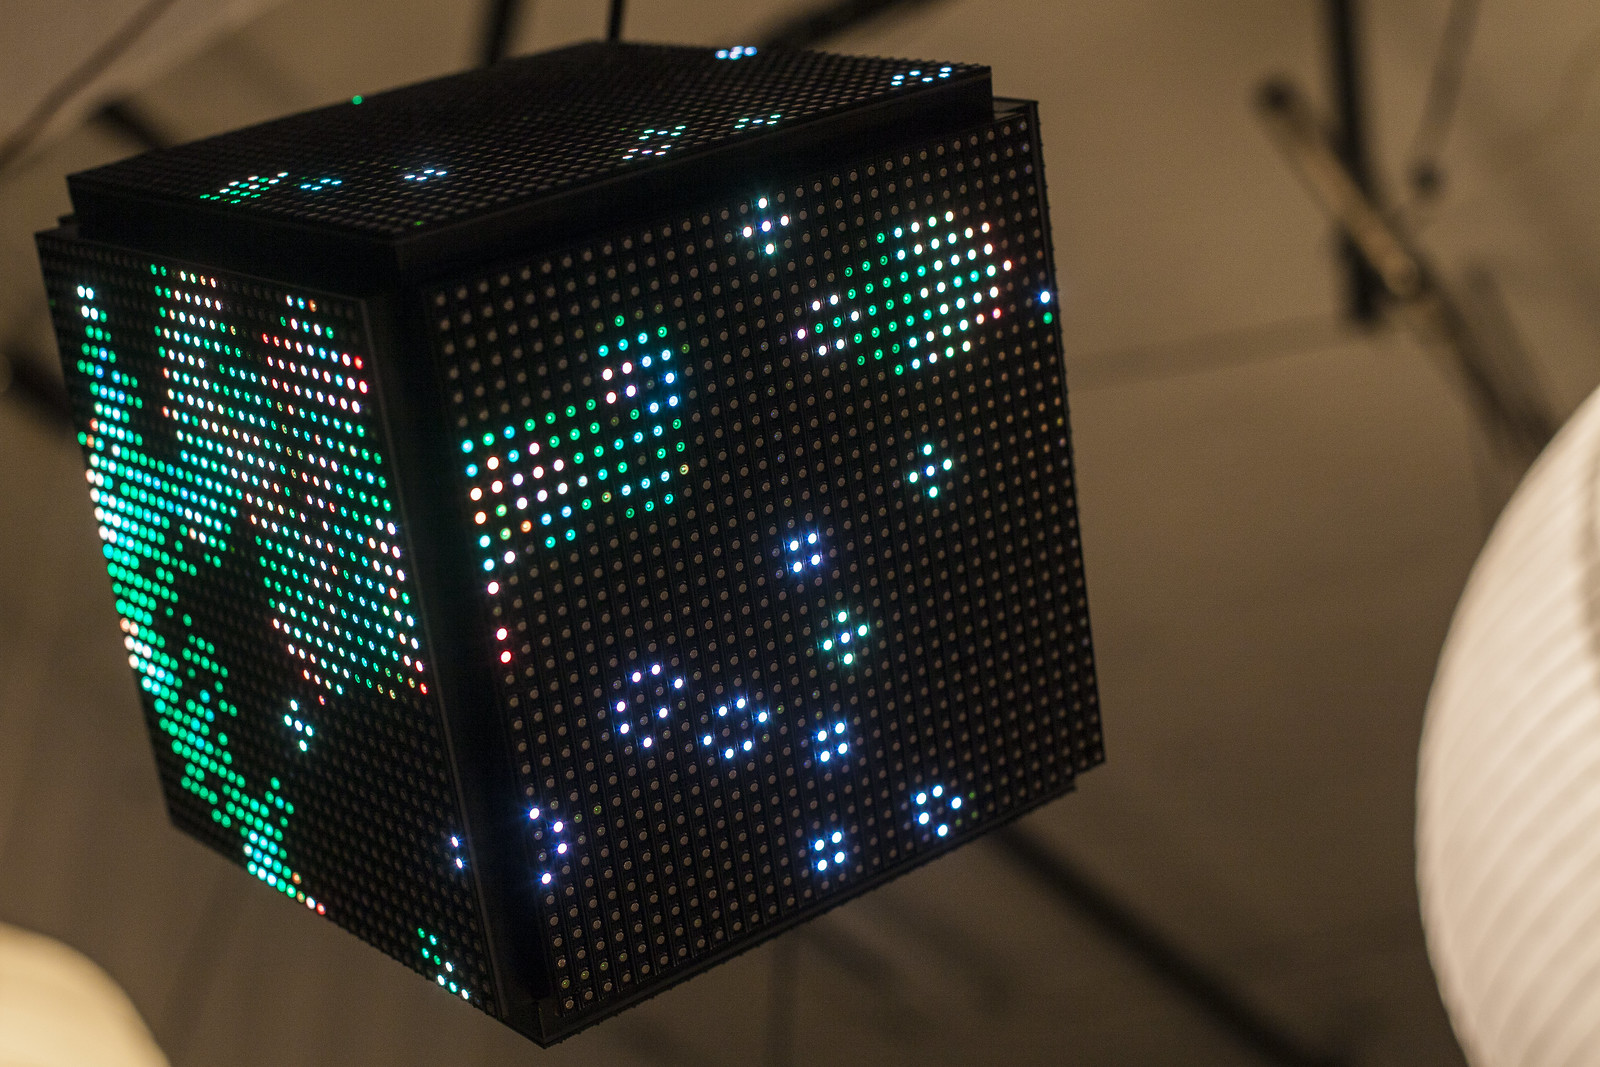 Trammell's LED matrix cube. by wwward0